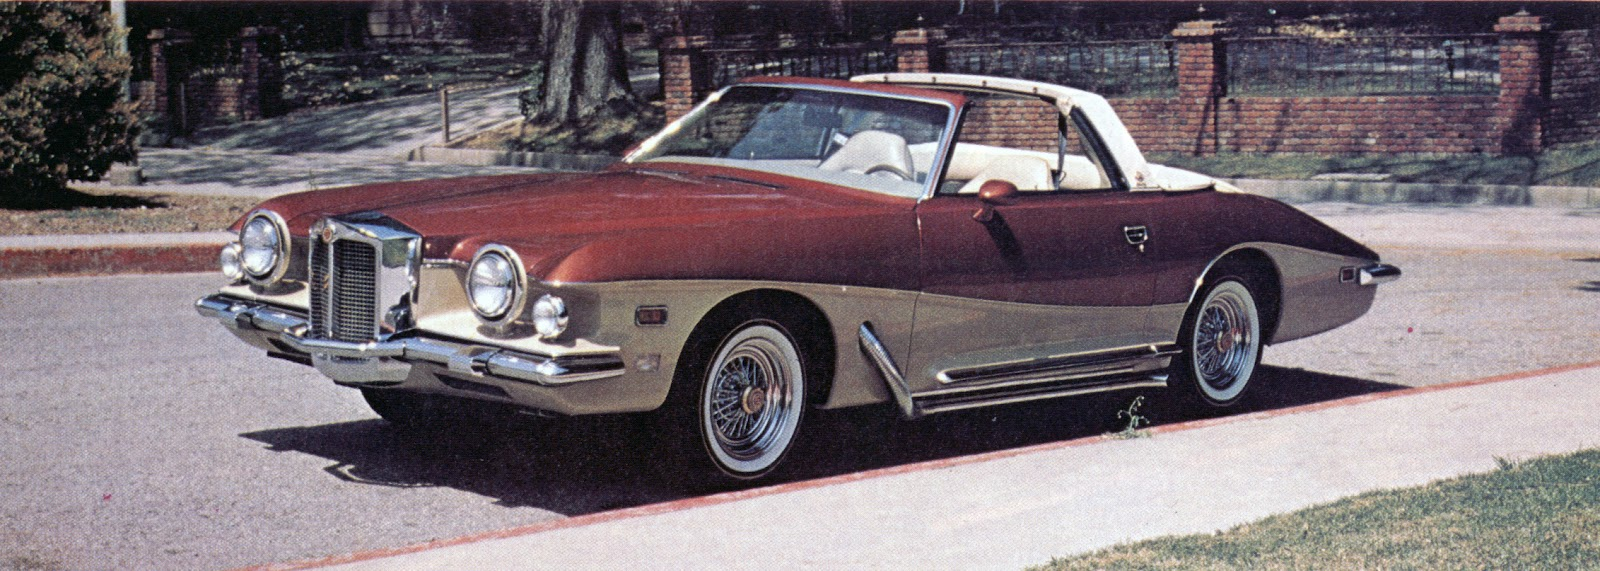 1976 Stutz Blackhawk Coupe |1976 Stutz Bearcat